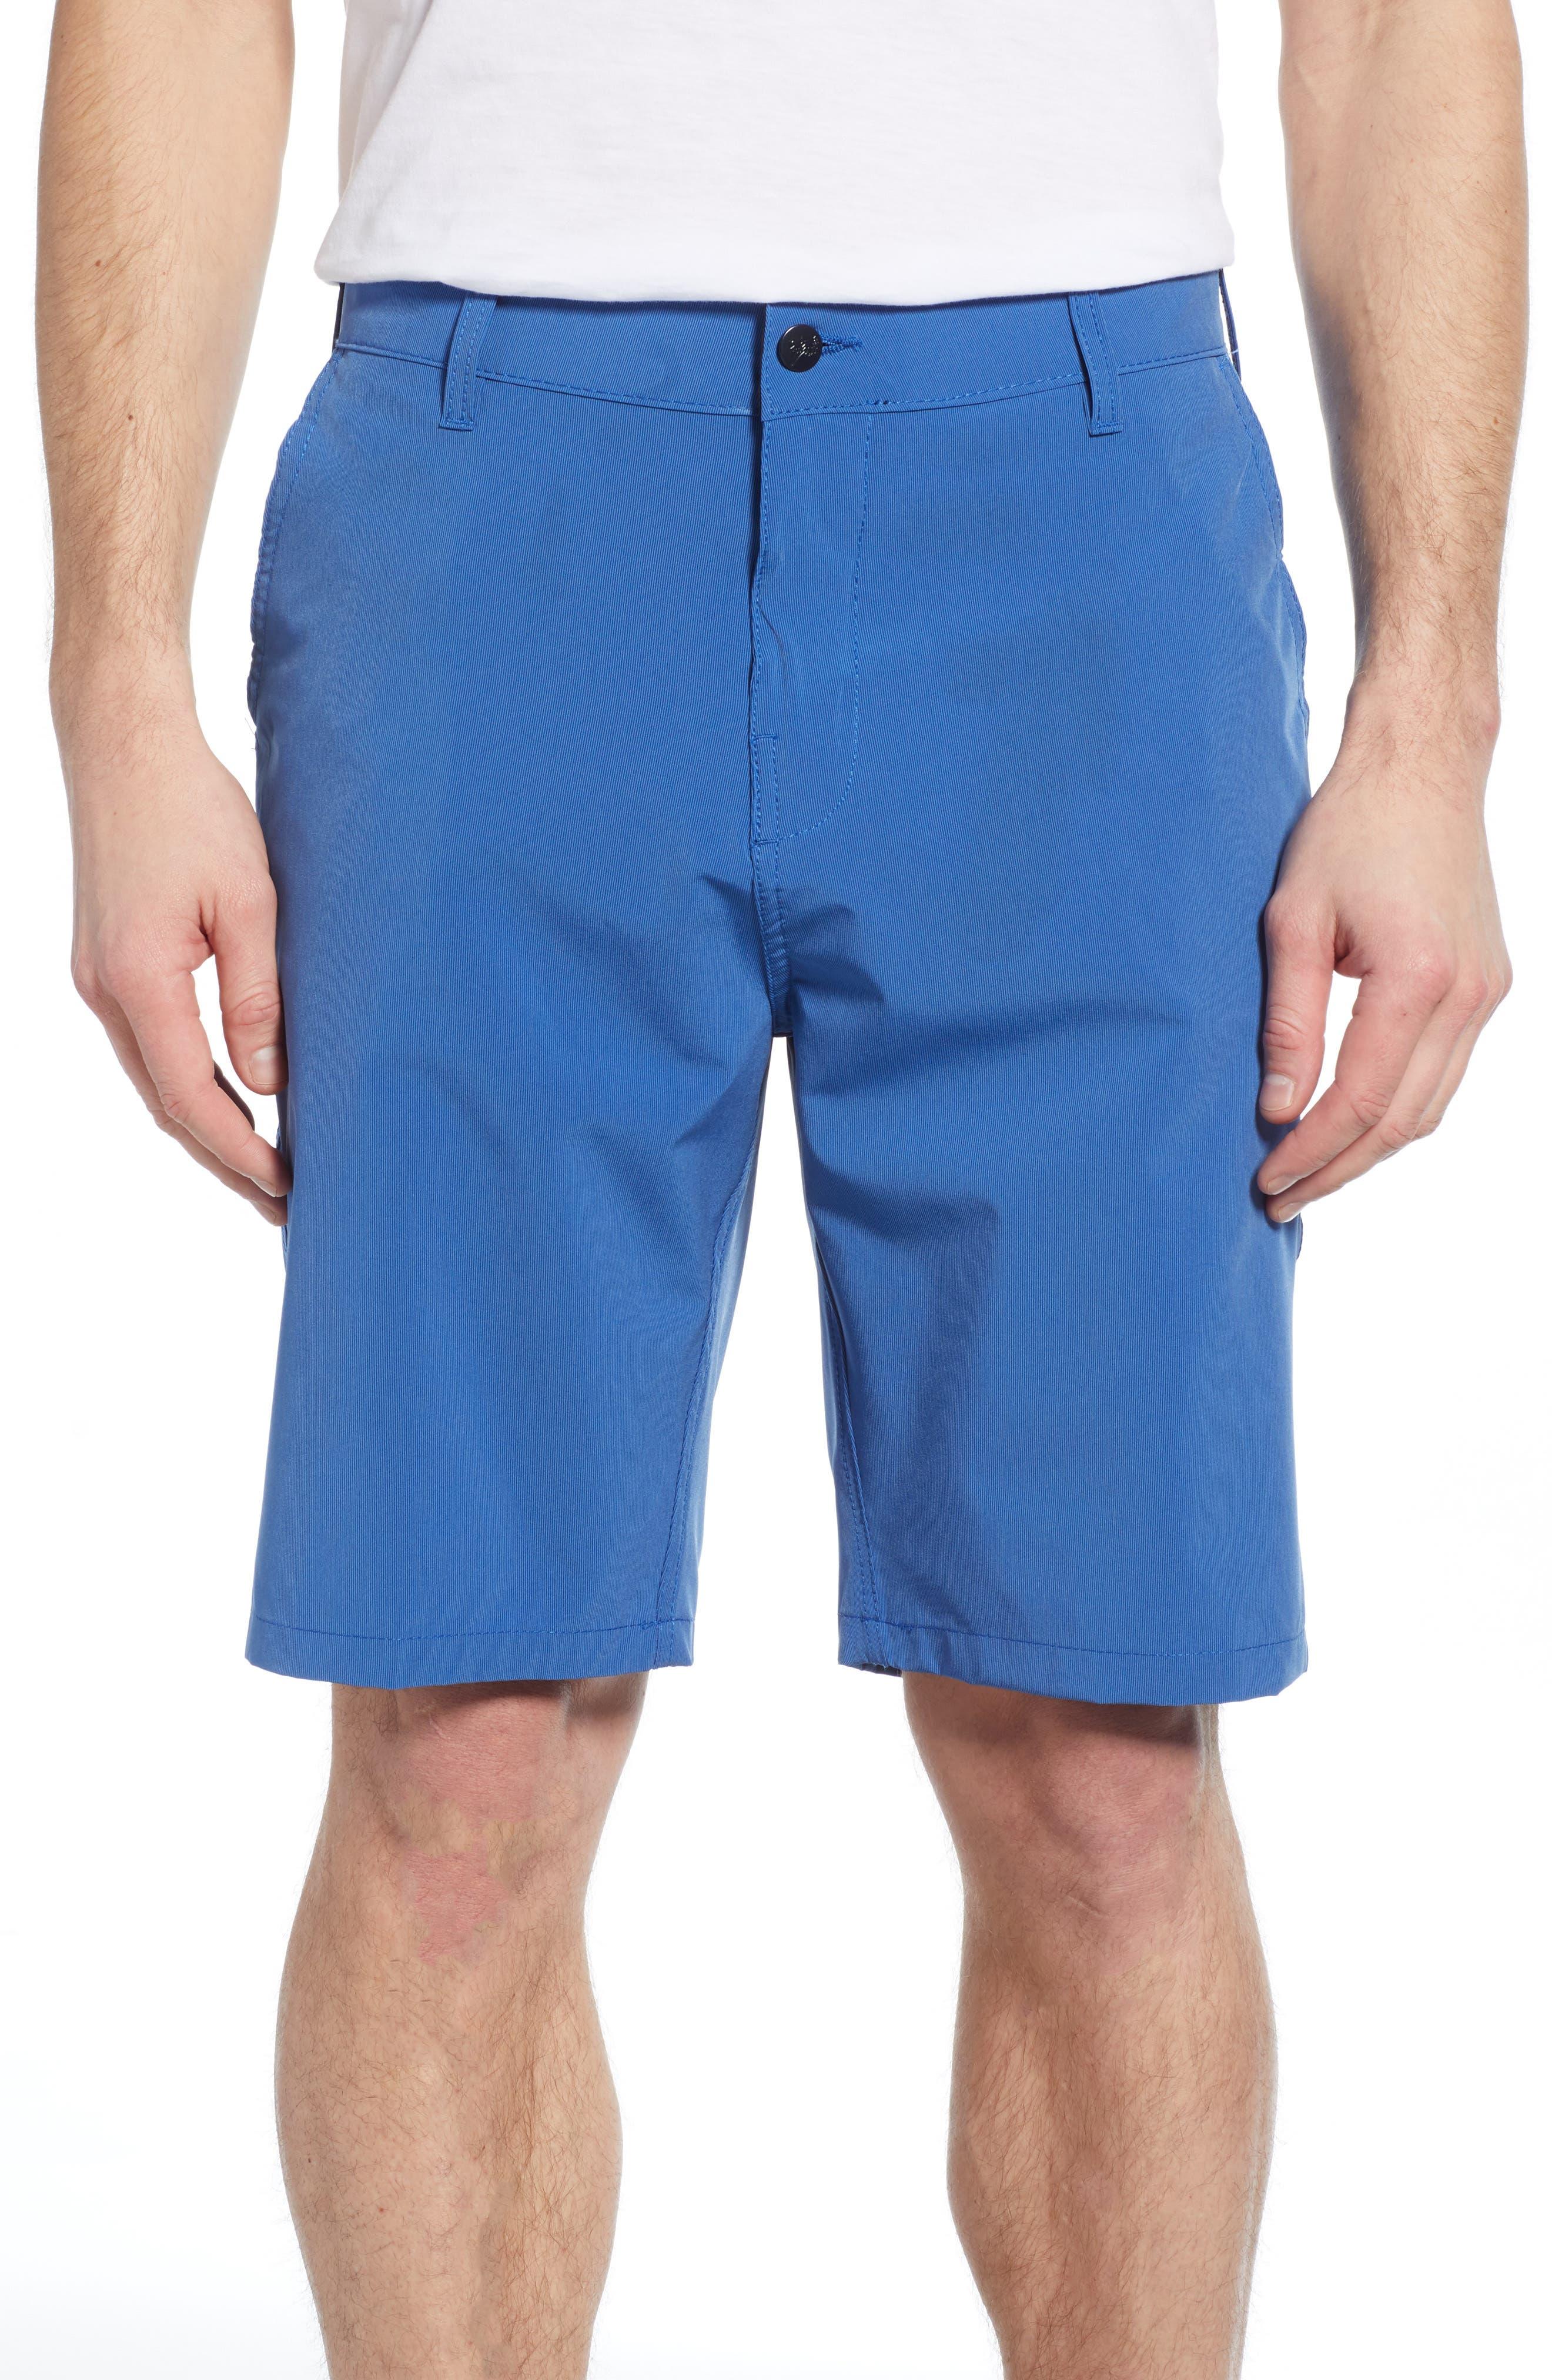 Trunks Surf & Swim Co. Hybrid Board Shorts, Blue